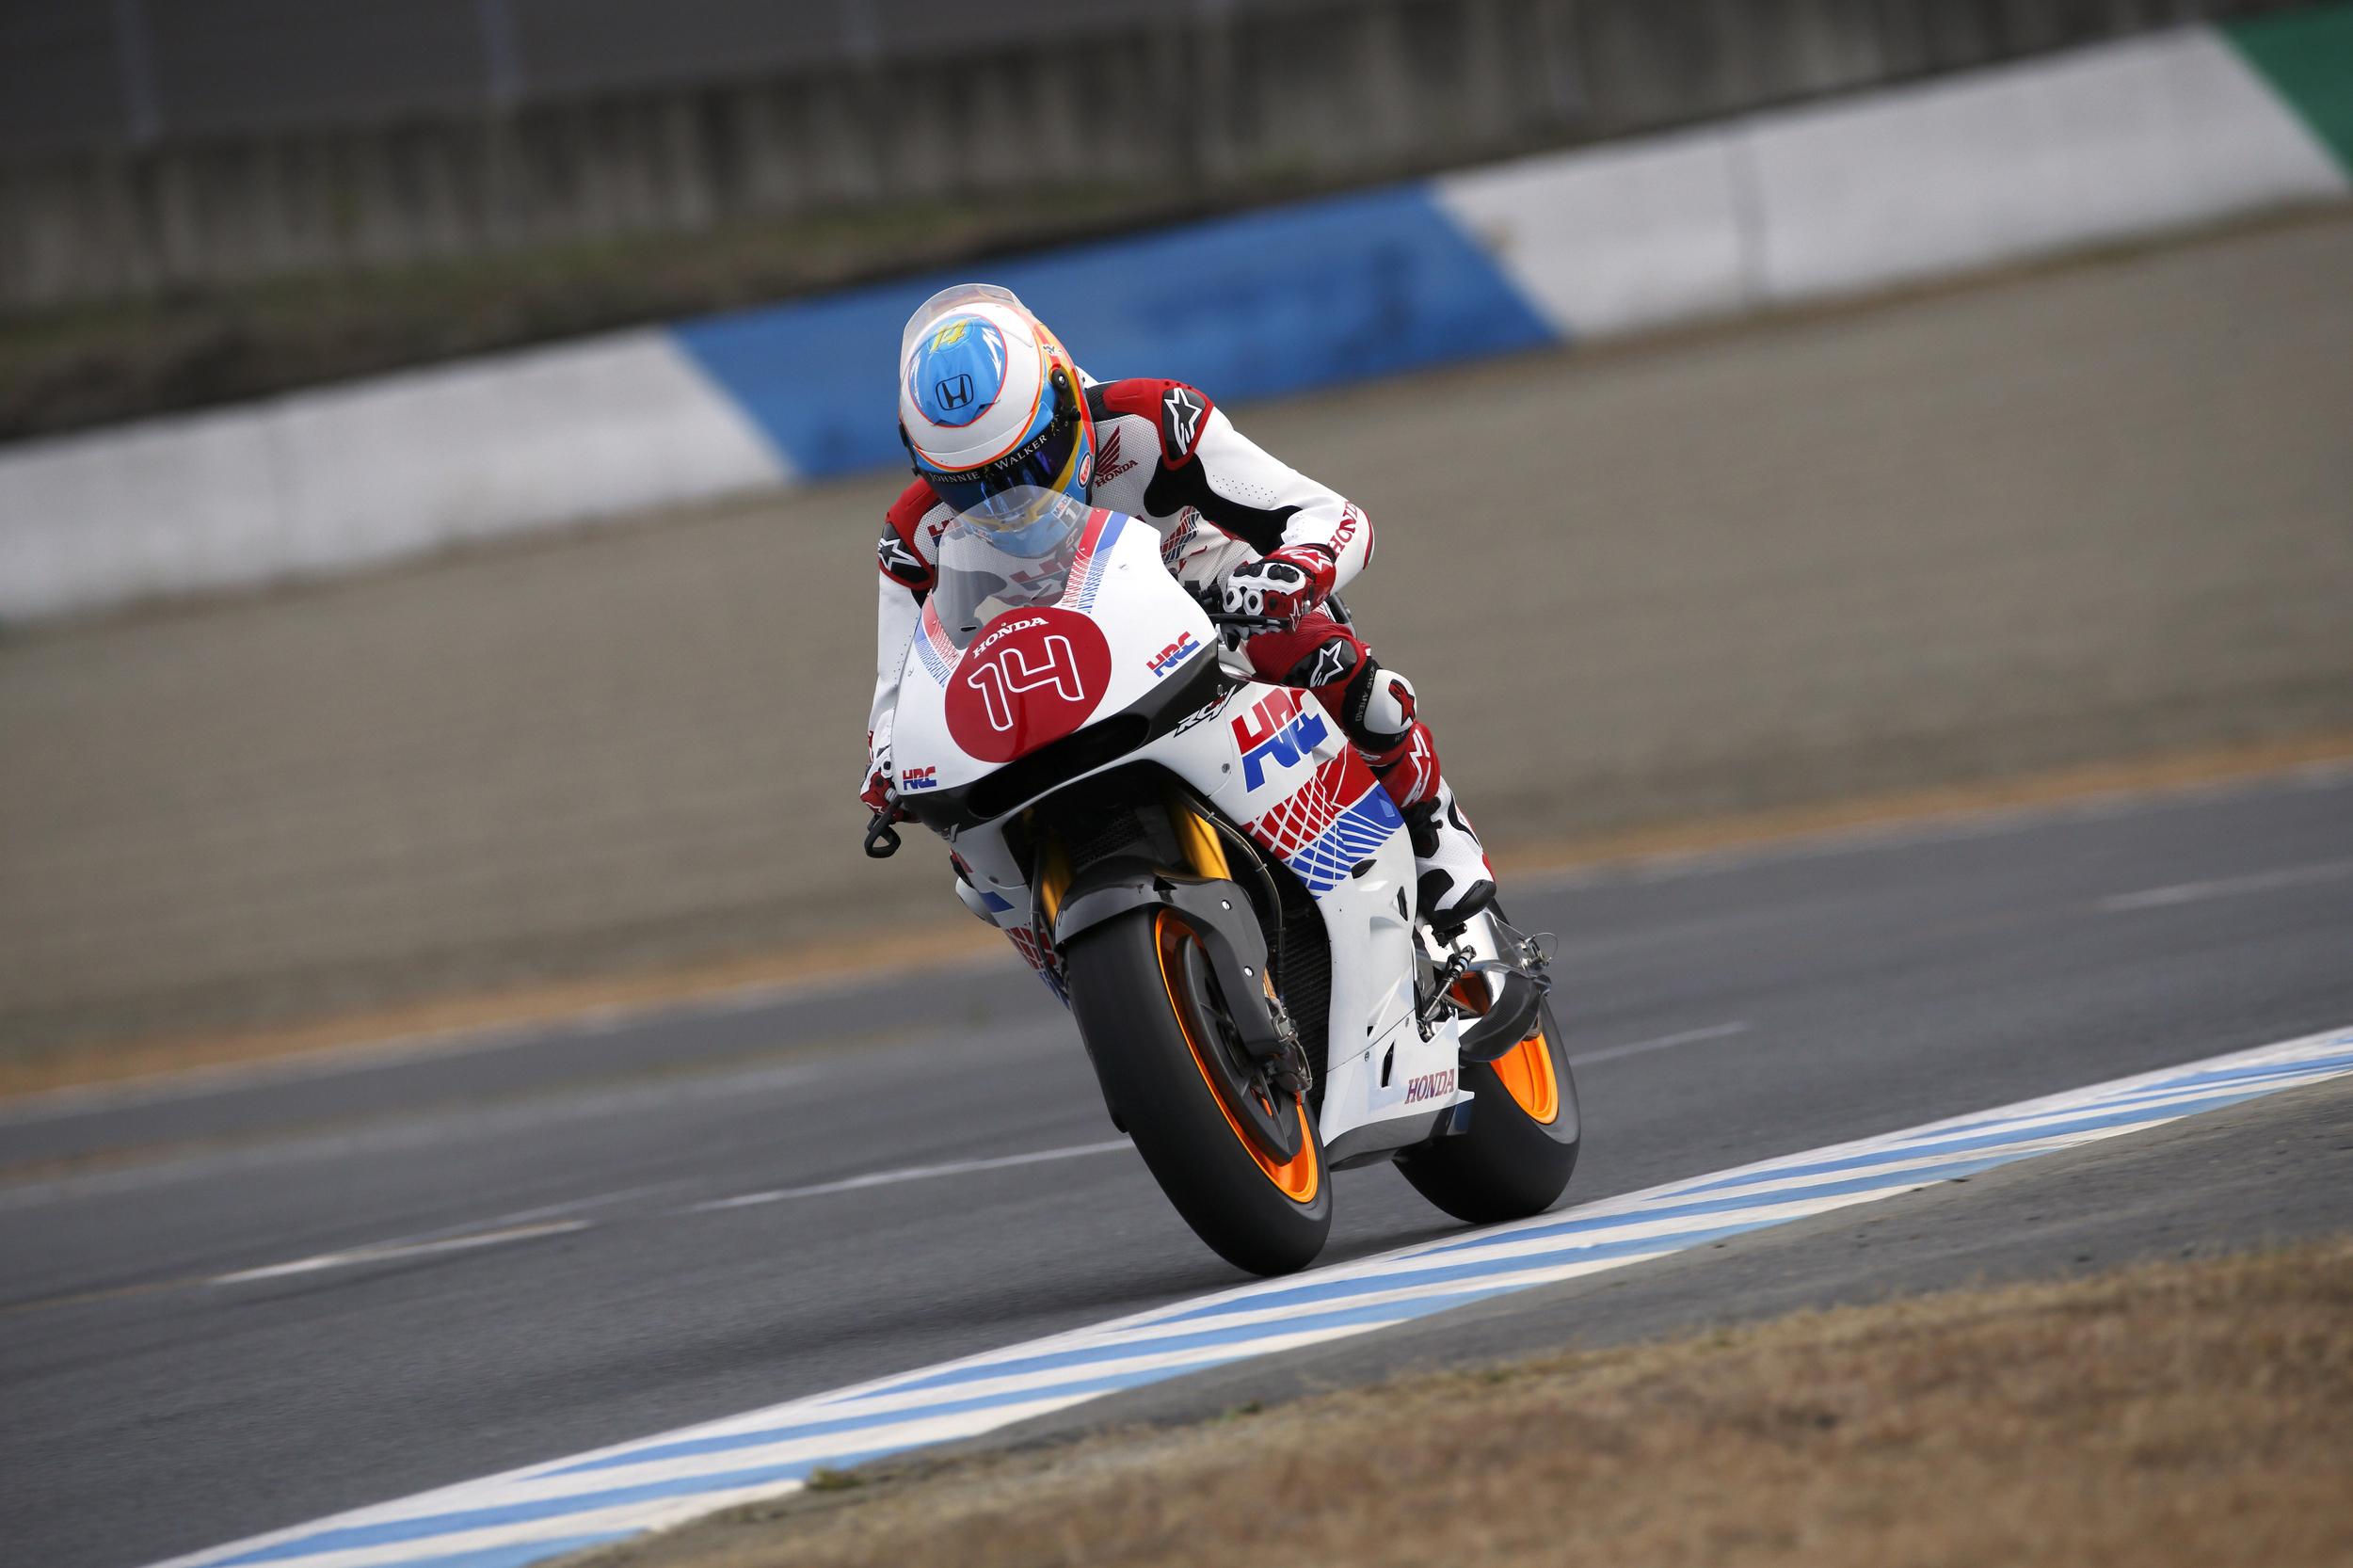 Fernando Alonso Rode Honda RC213V 2